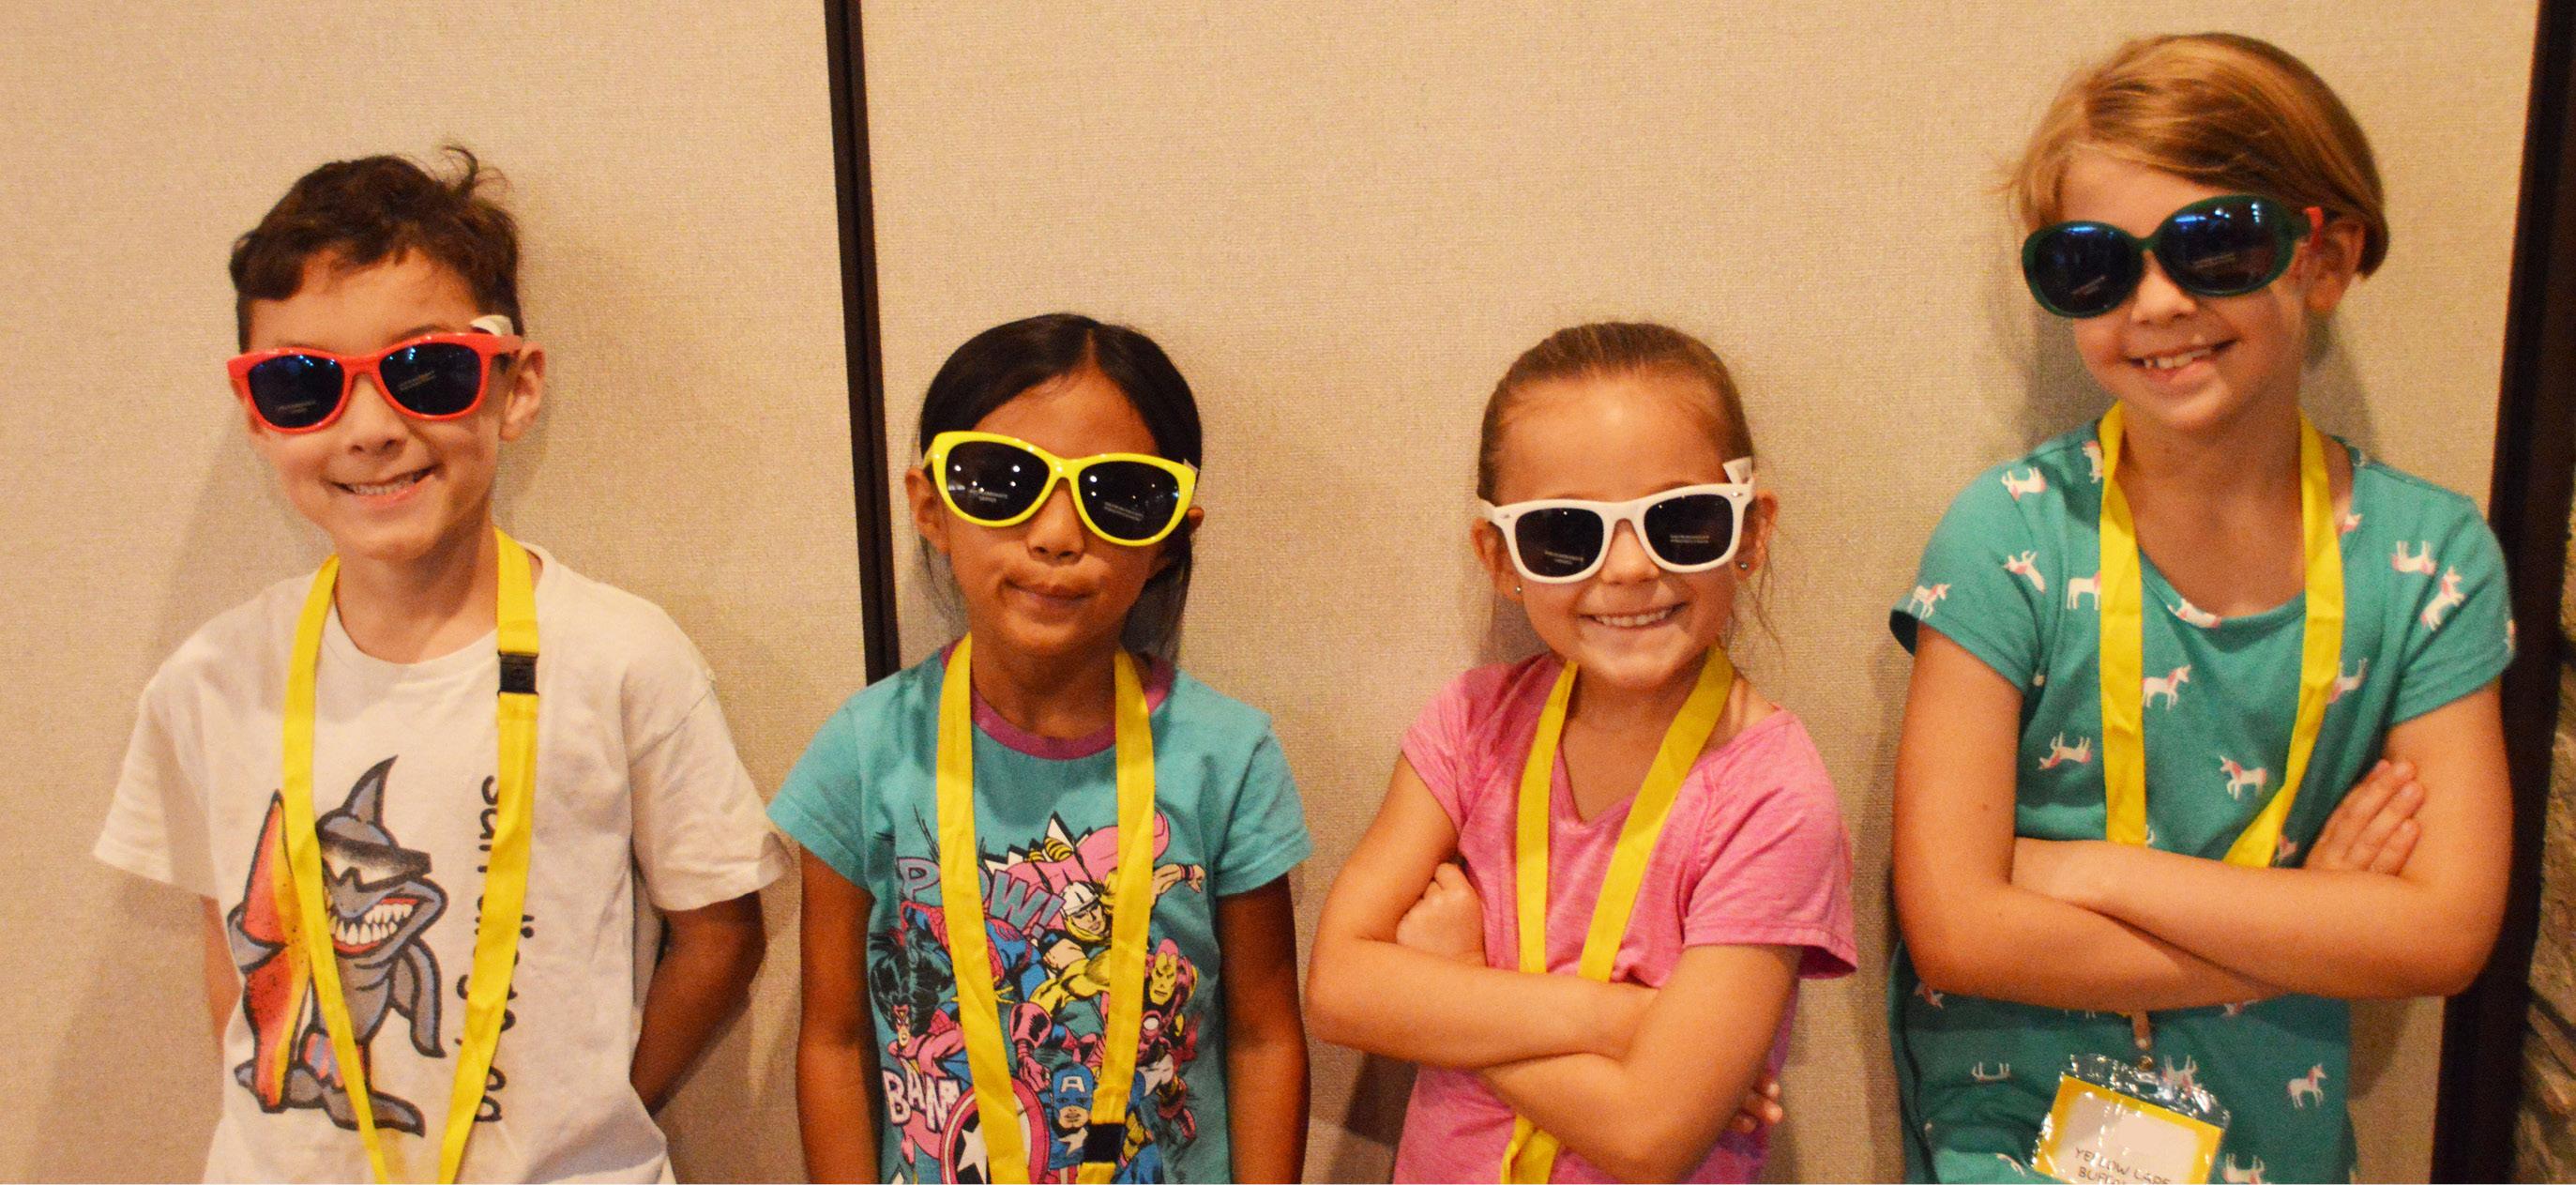 Kids-Wearing-Sunglasses-VBS-2019